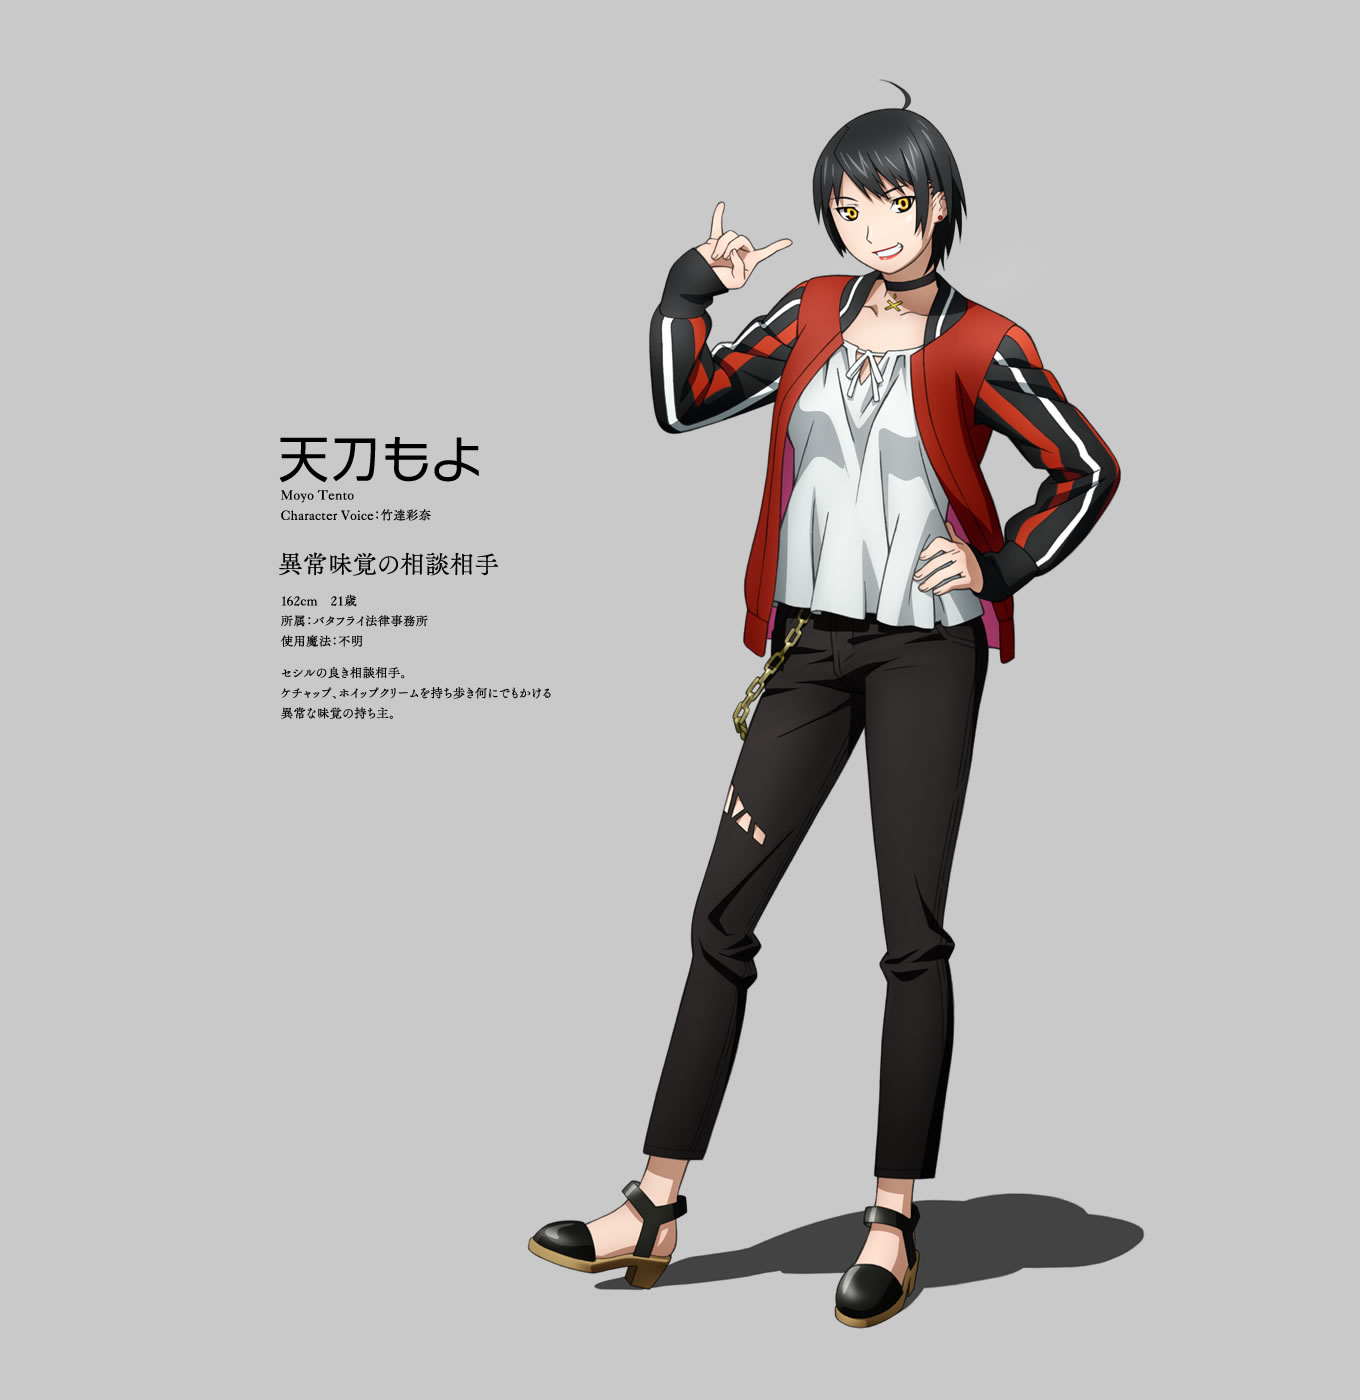 Wizard Barristers: Benmashi Cecil - Zerochan Anime Image Board